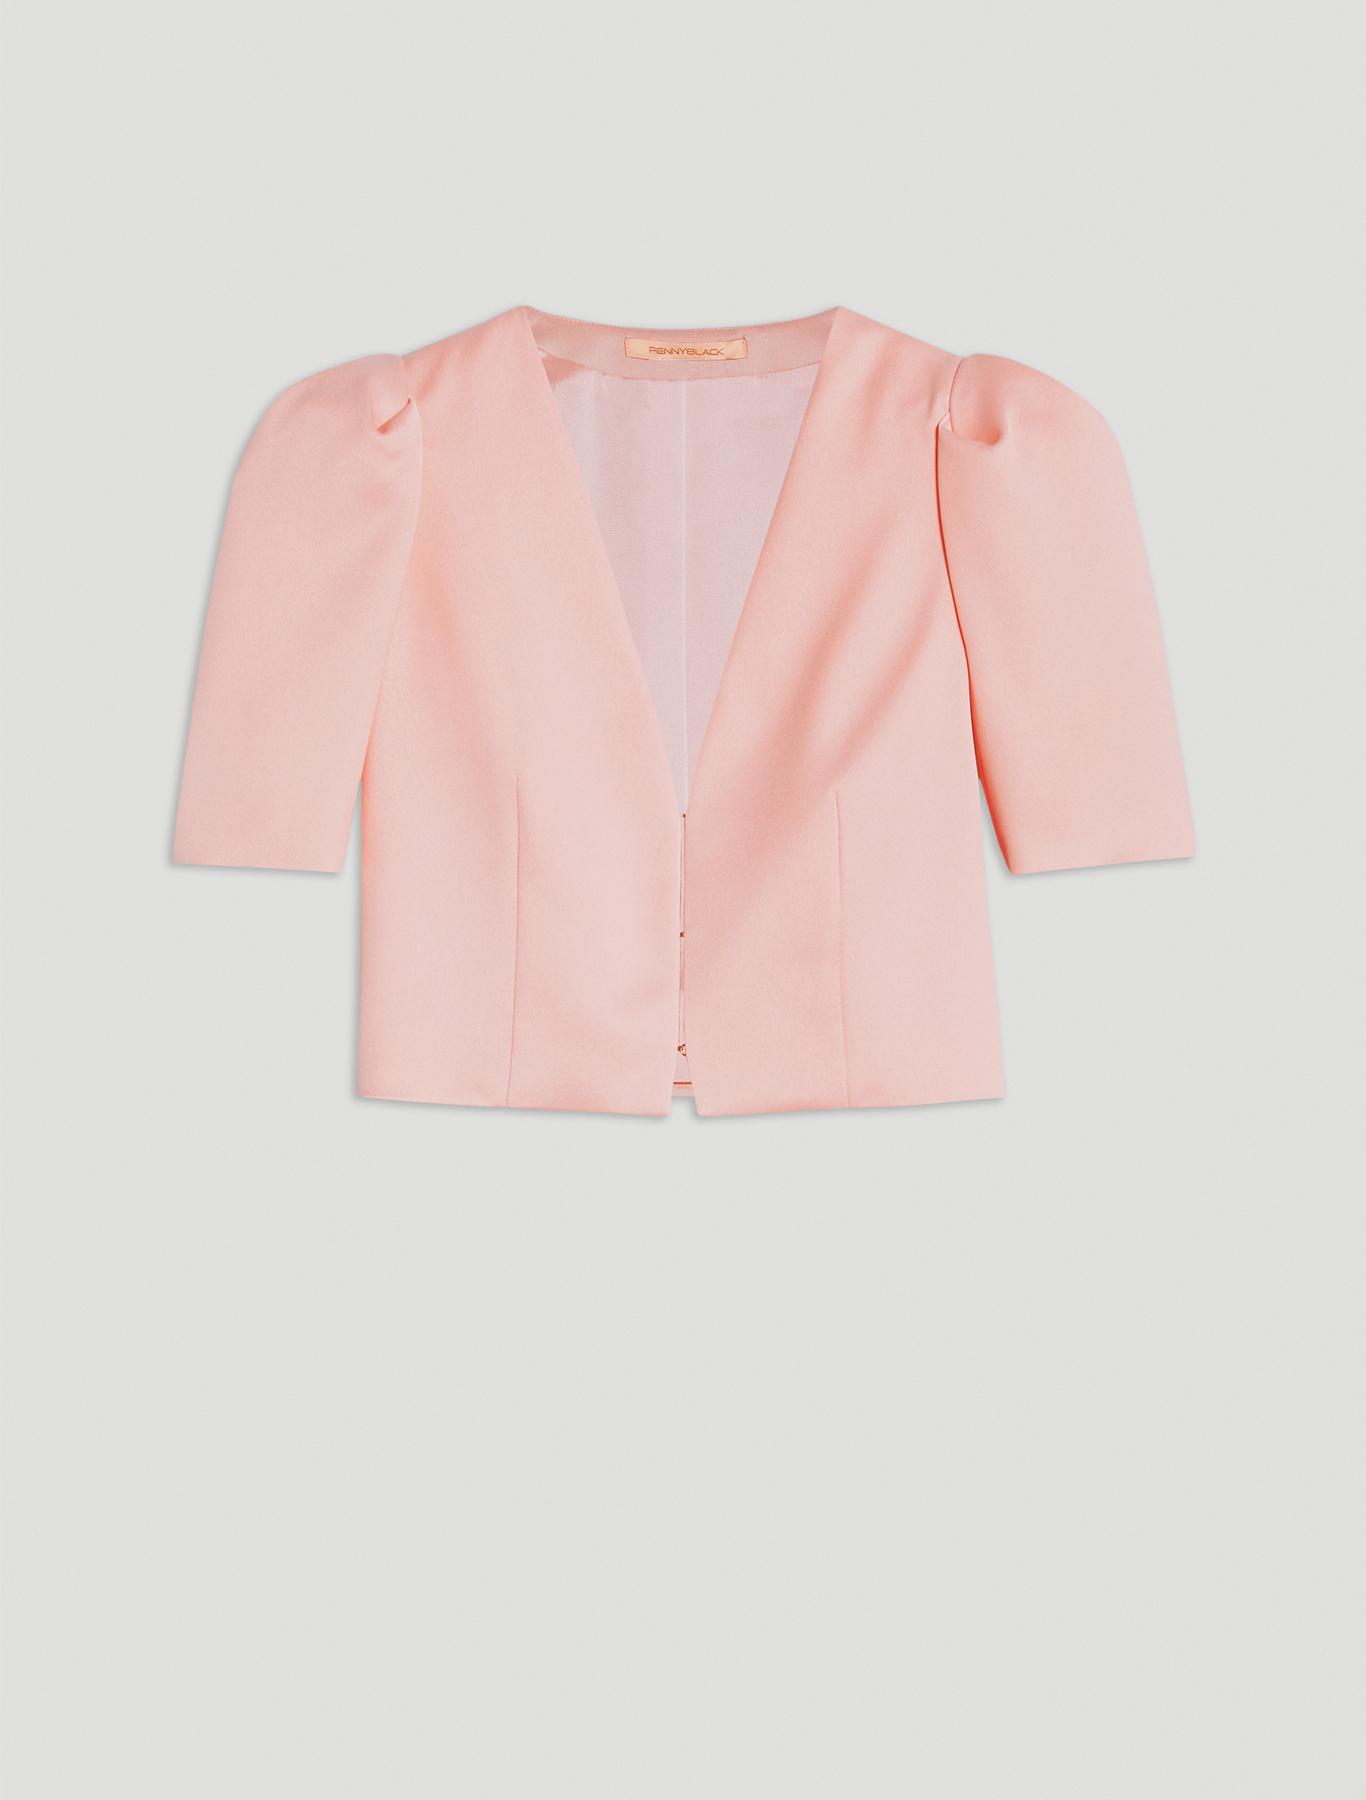 Bolero jacket in envers satin - pink - pennyblack